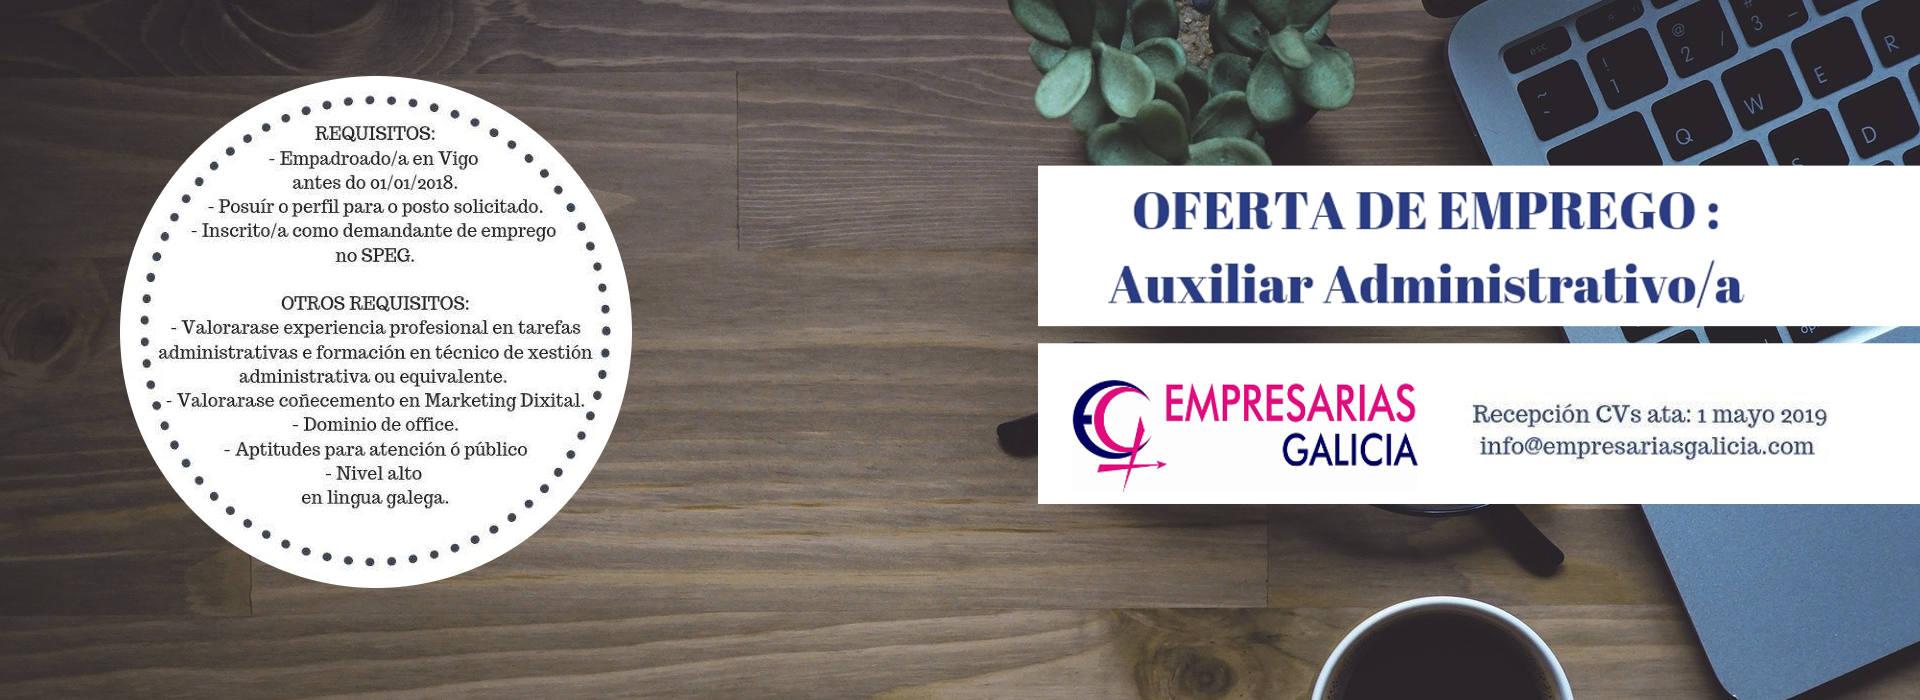 auxiliar administrativo oferta